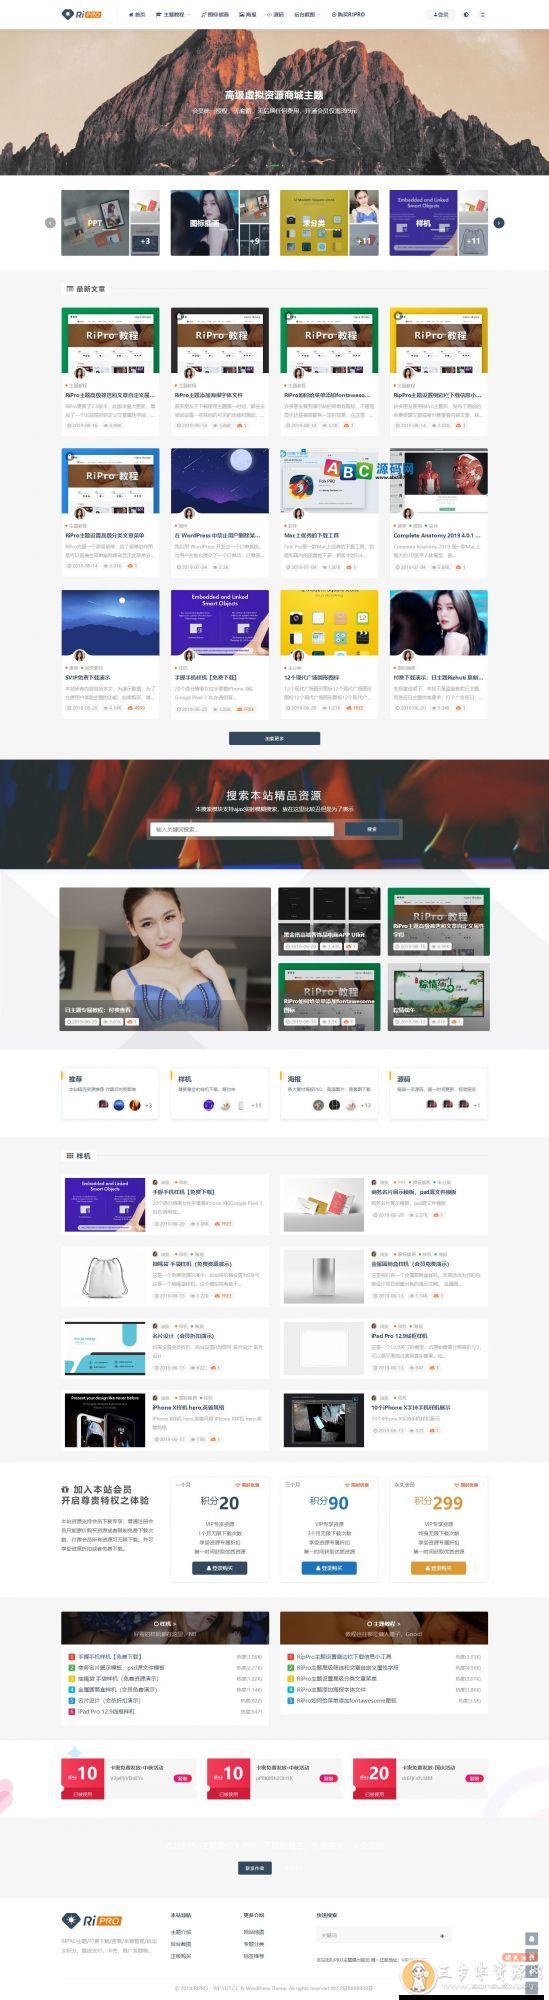 WordPress主题,RiPro v5.0高级付费素材资源类主题